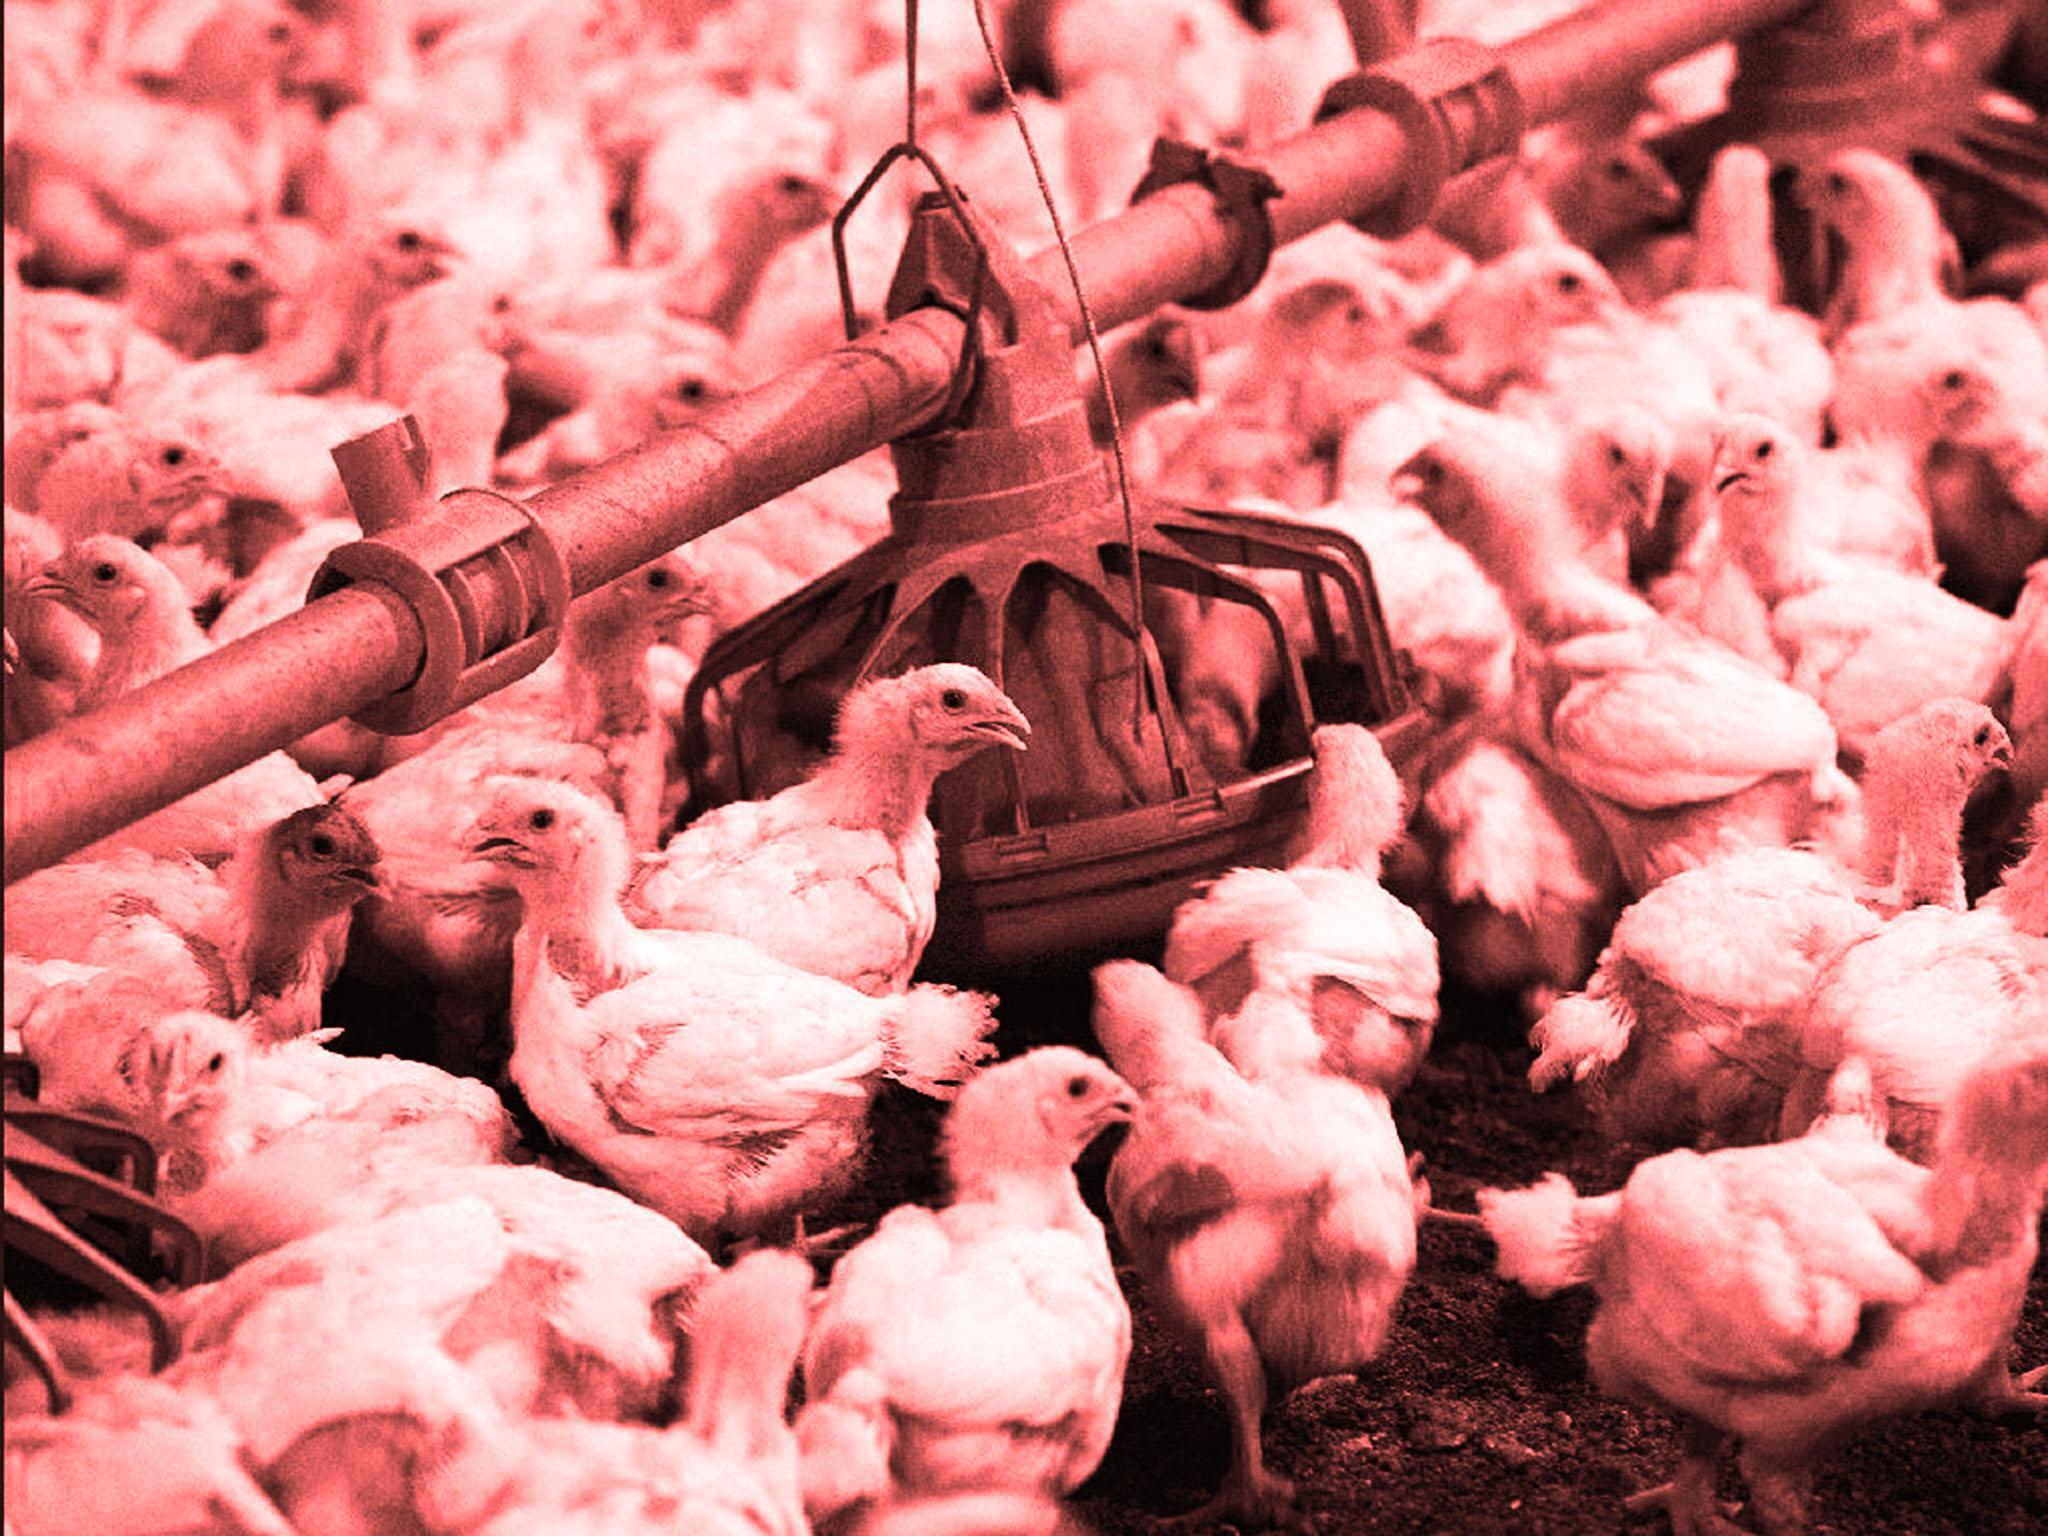 chlorinated chicken - photo #3